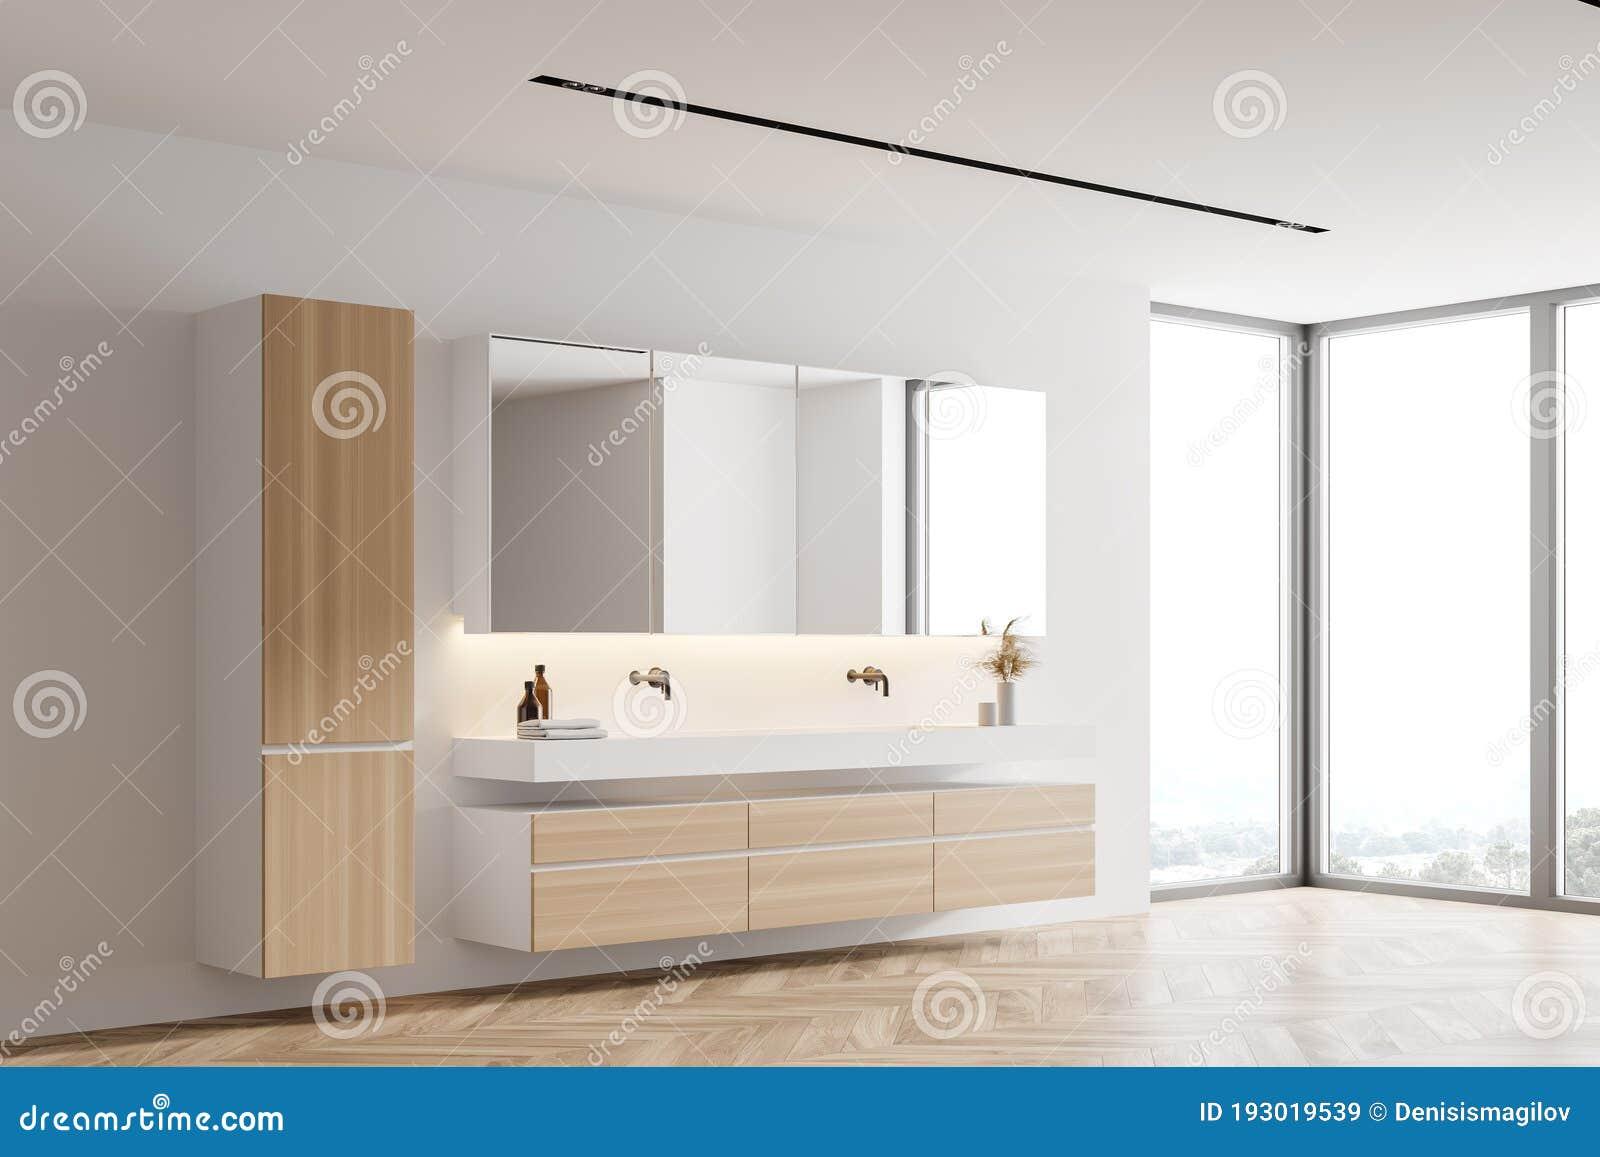 White Bathroom Corner With Double Sink Stock Illustration Illustration Of Inside Property 193019539